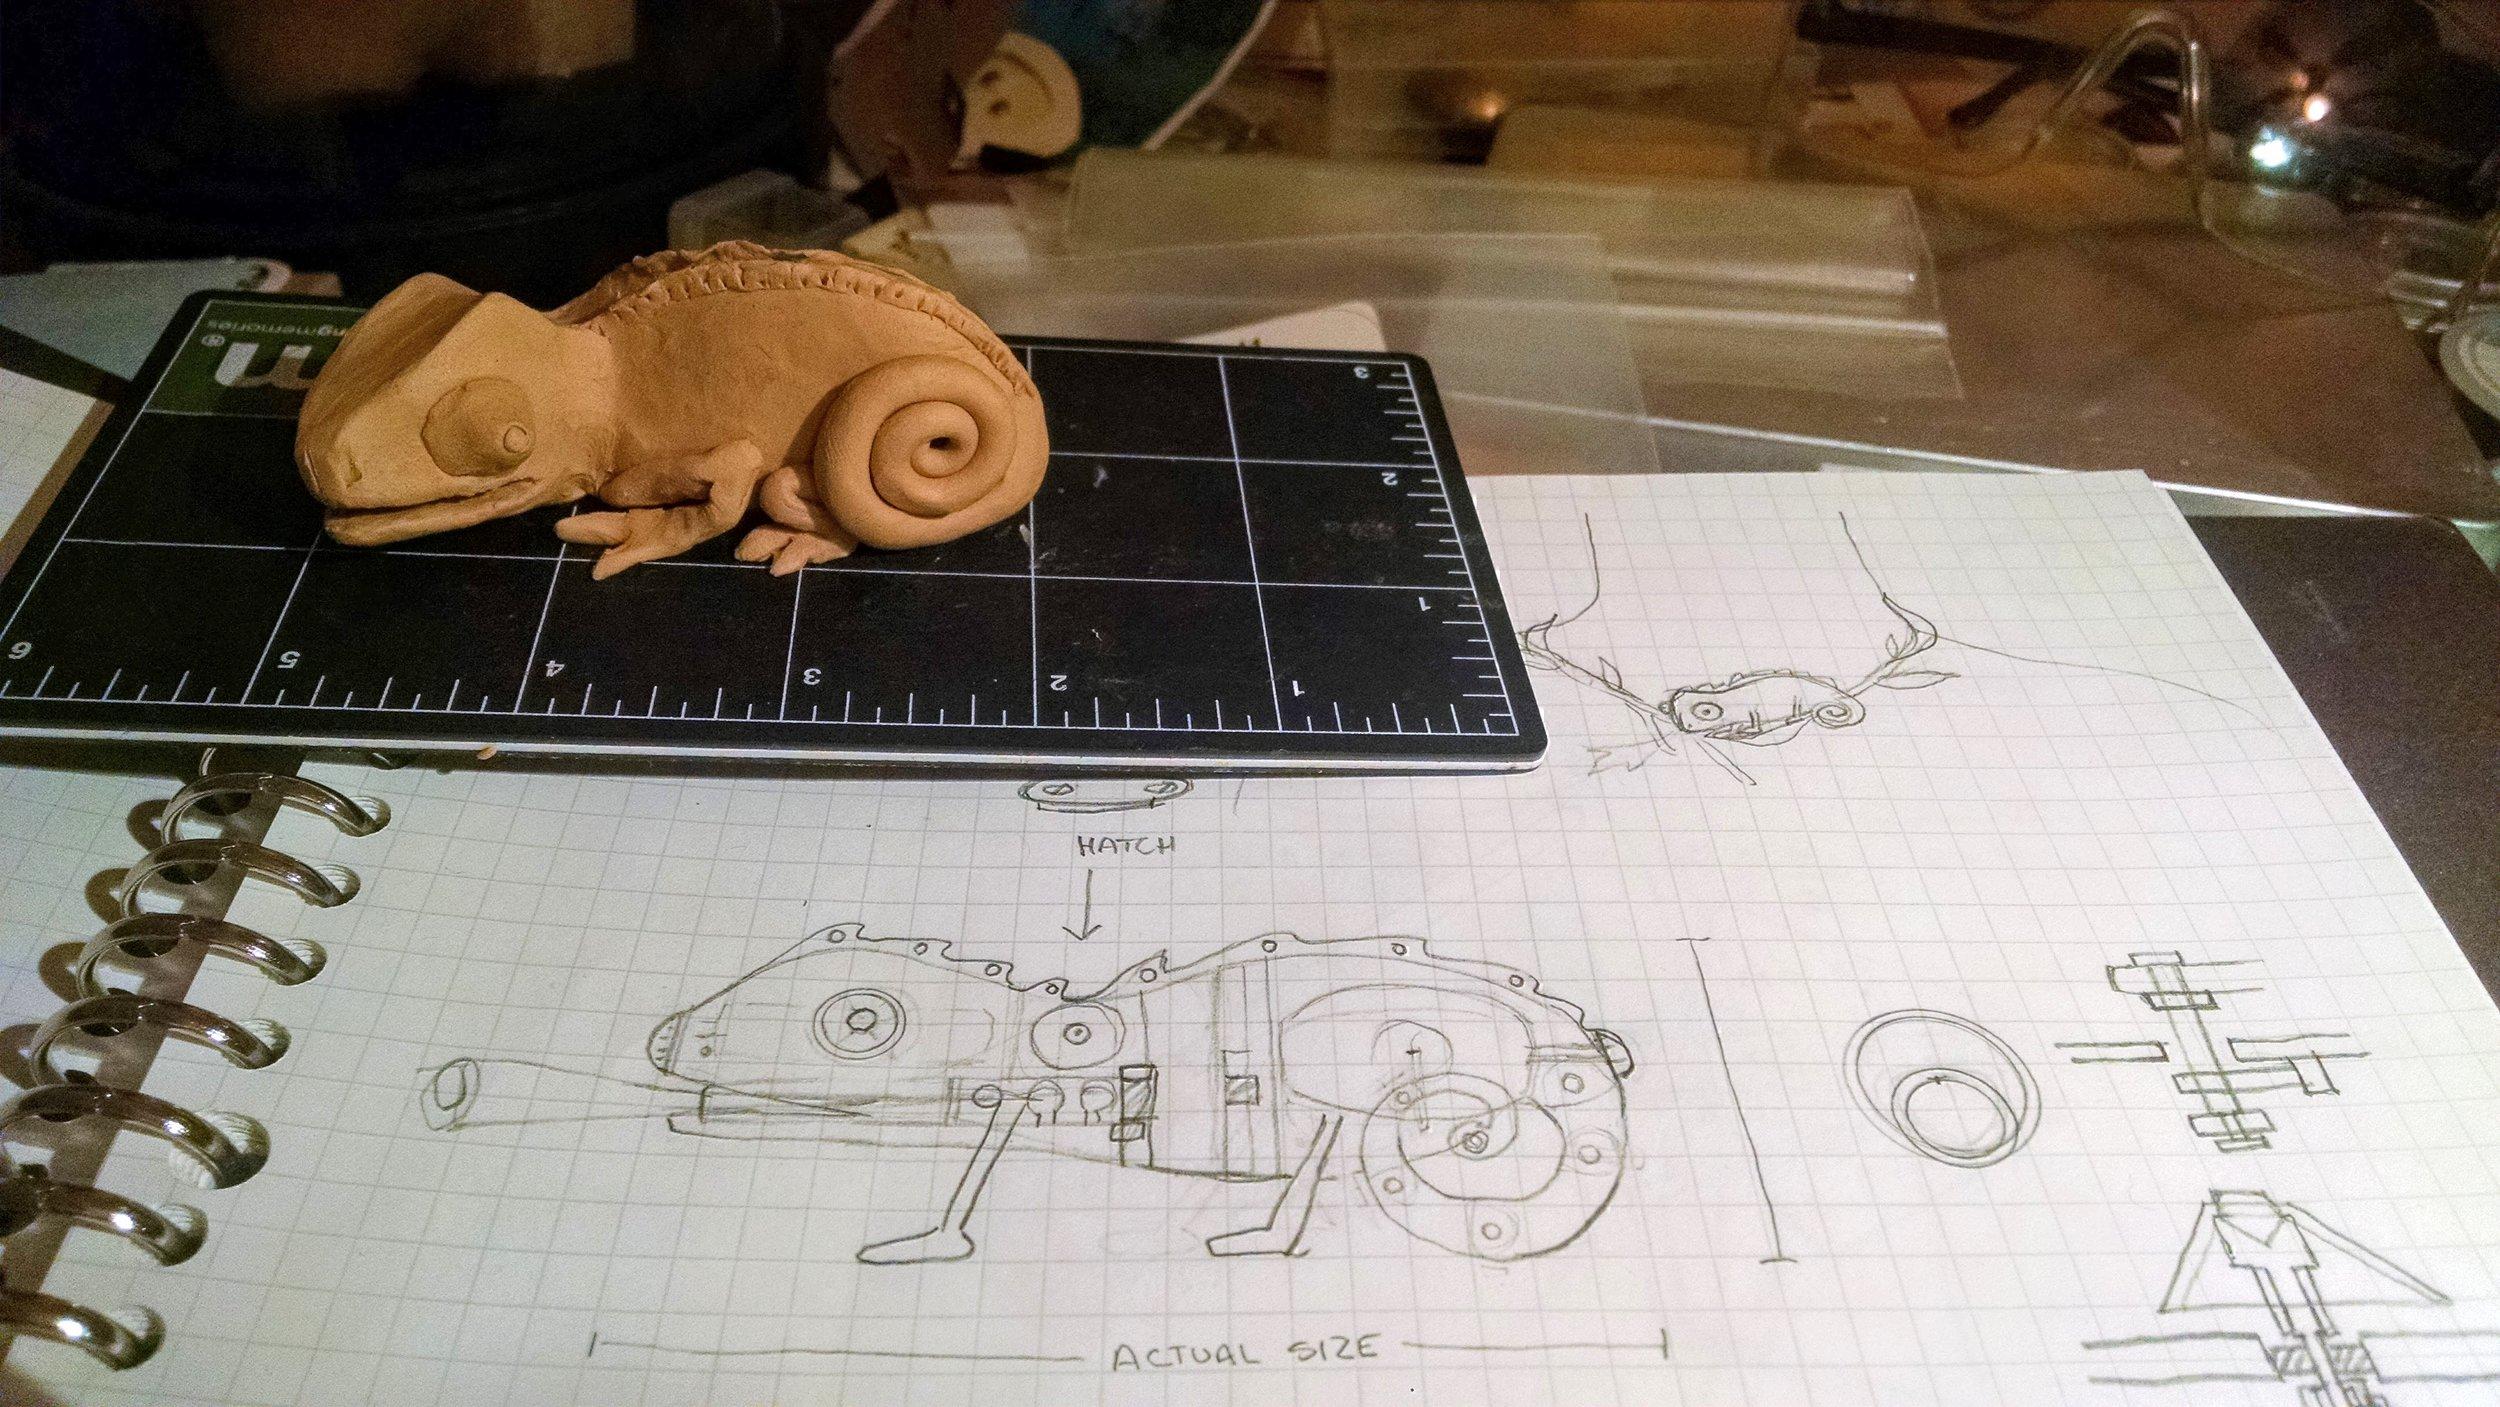 Chameleon Model and Diagrams